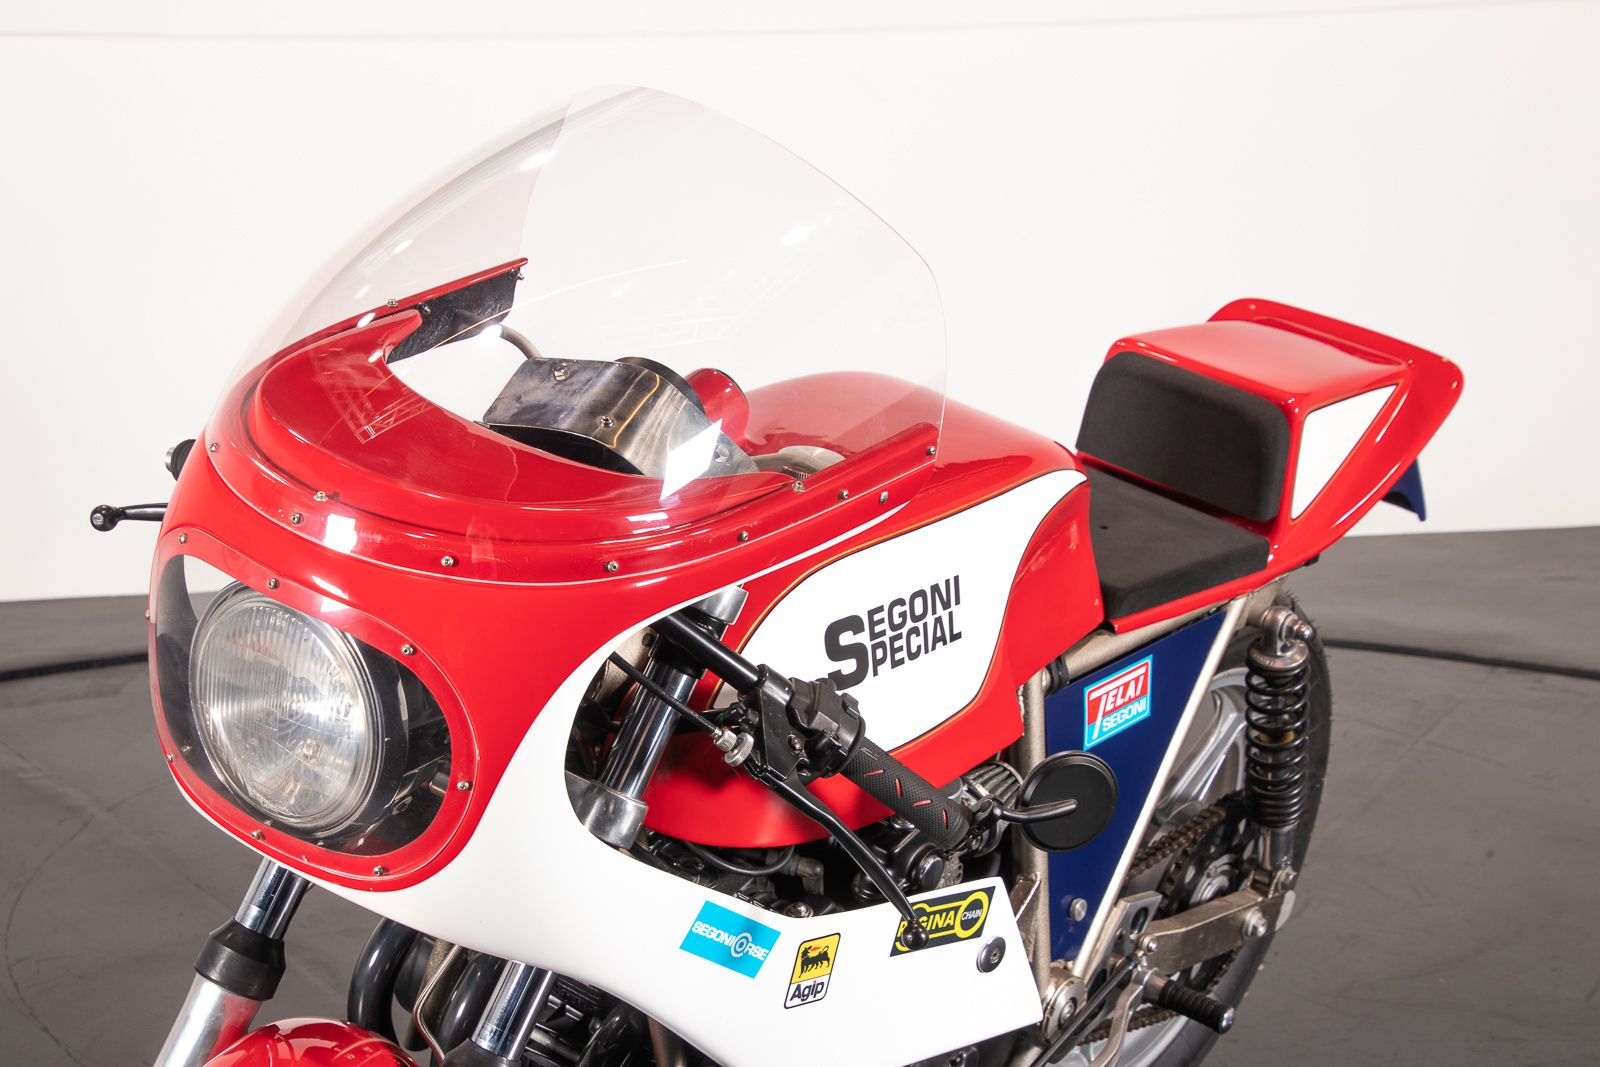 1984 Kawasaki Segoni 750 46360